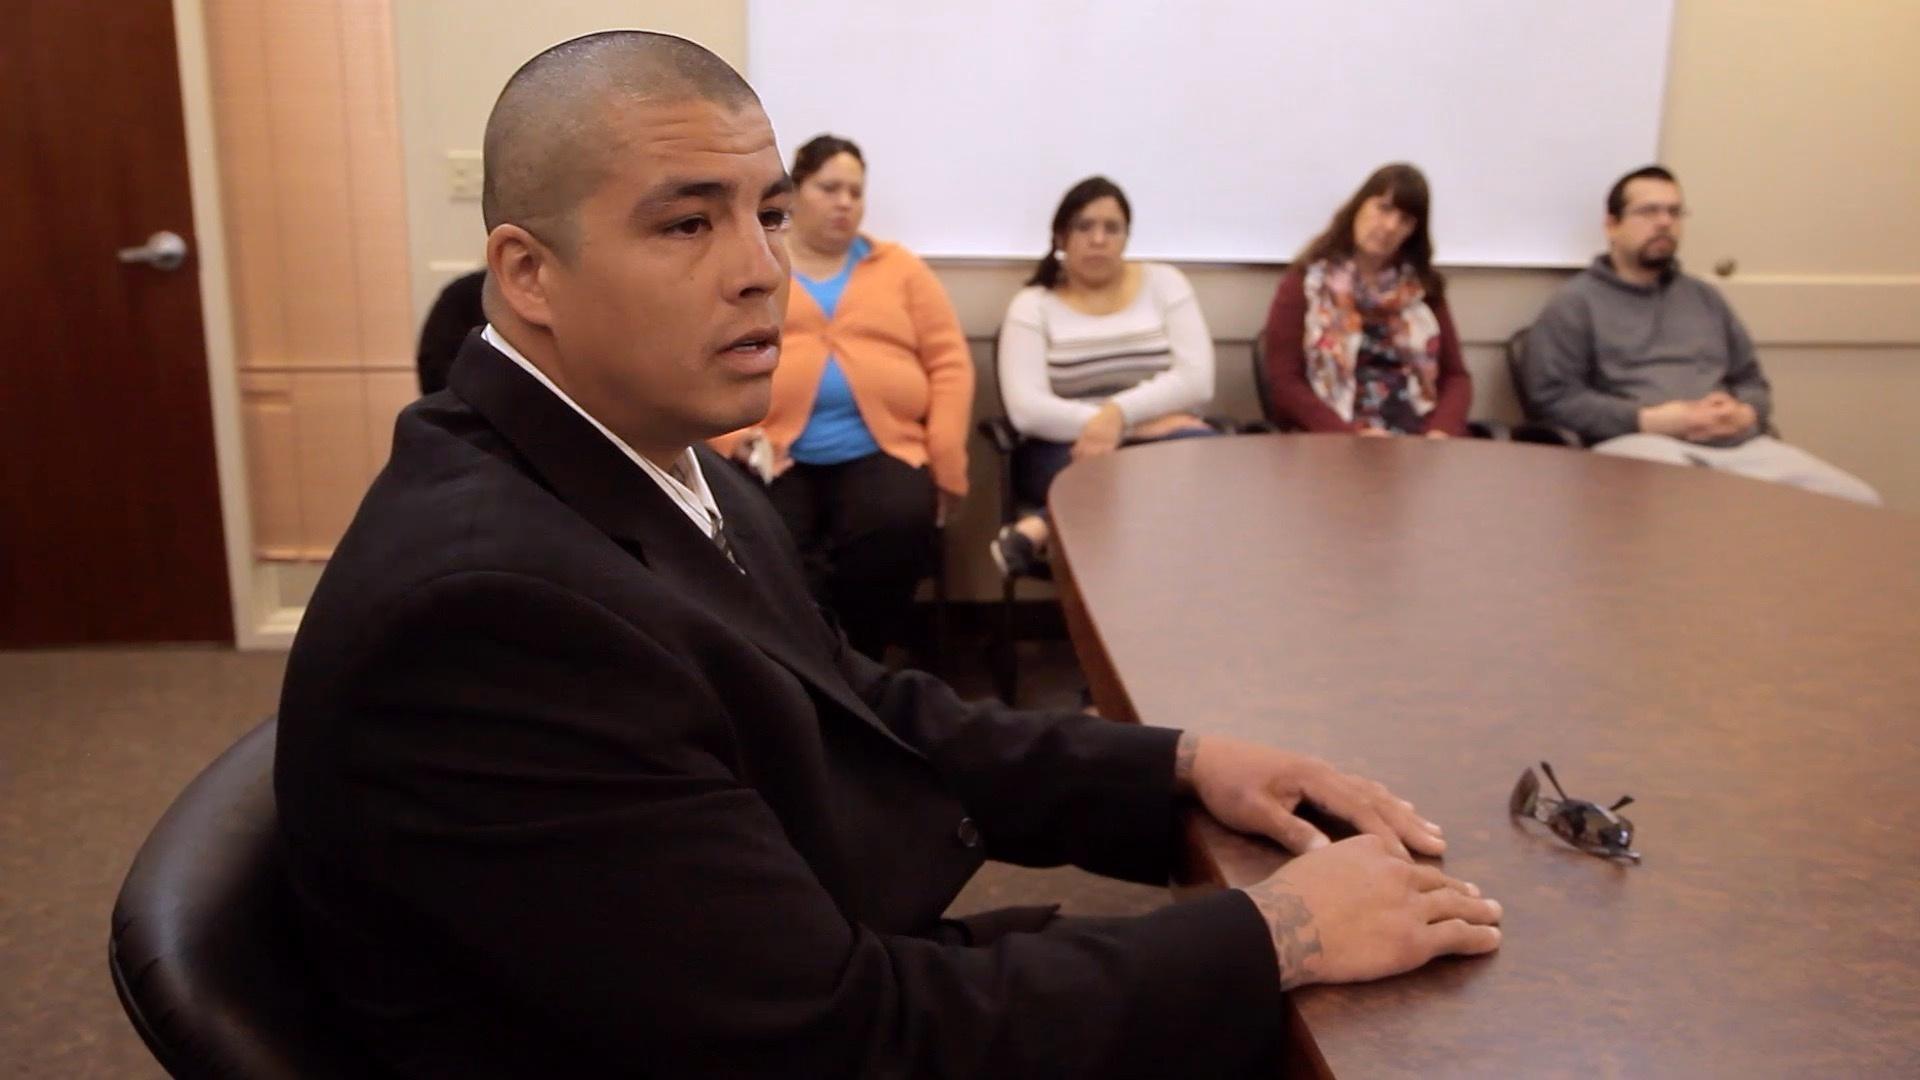 Classroom Clip: Yurok Tribe v. Taos Proctor